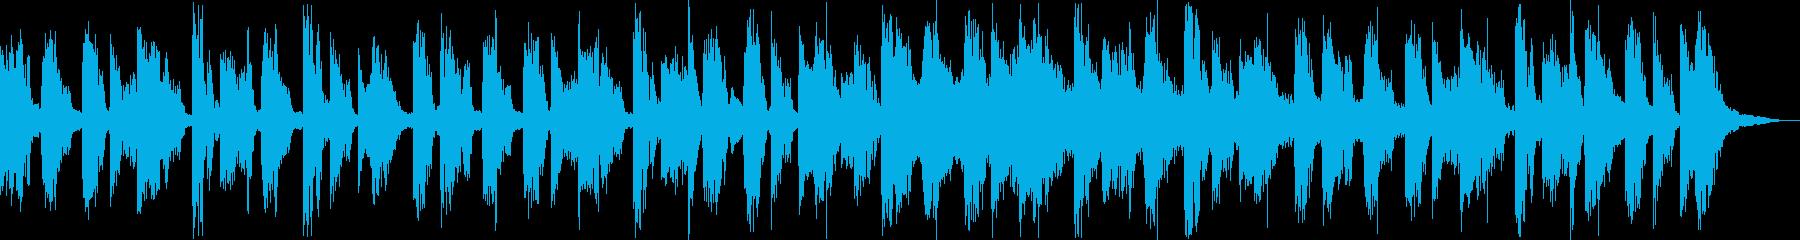 【CM】クールなエレクトロBGM・12の再生済みの波形